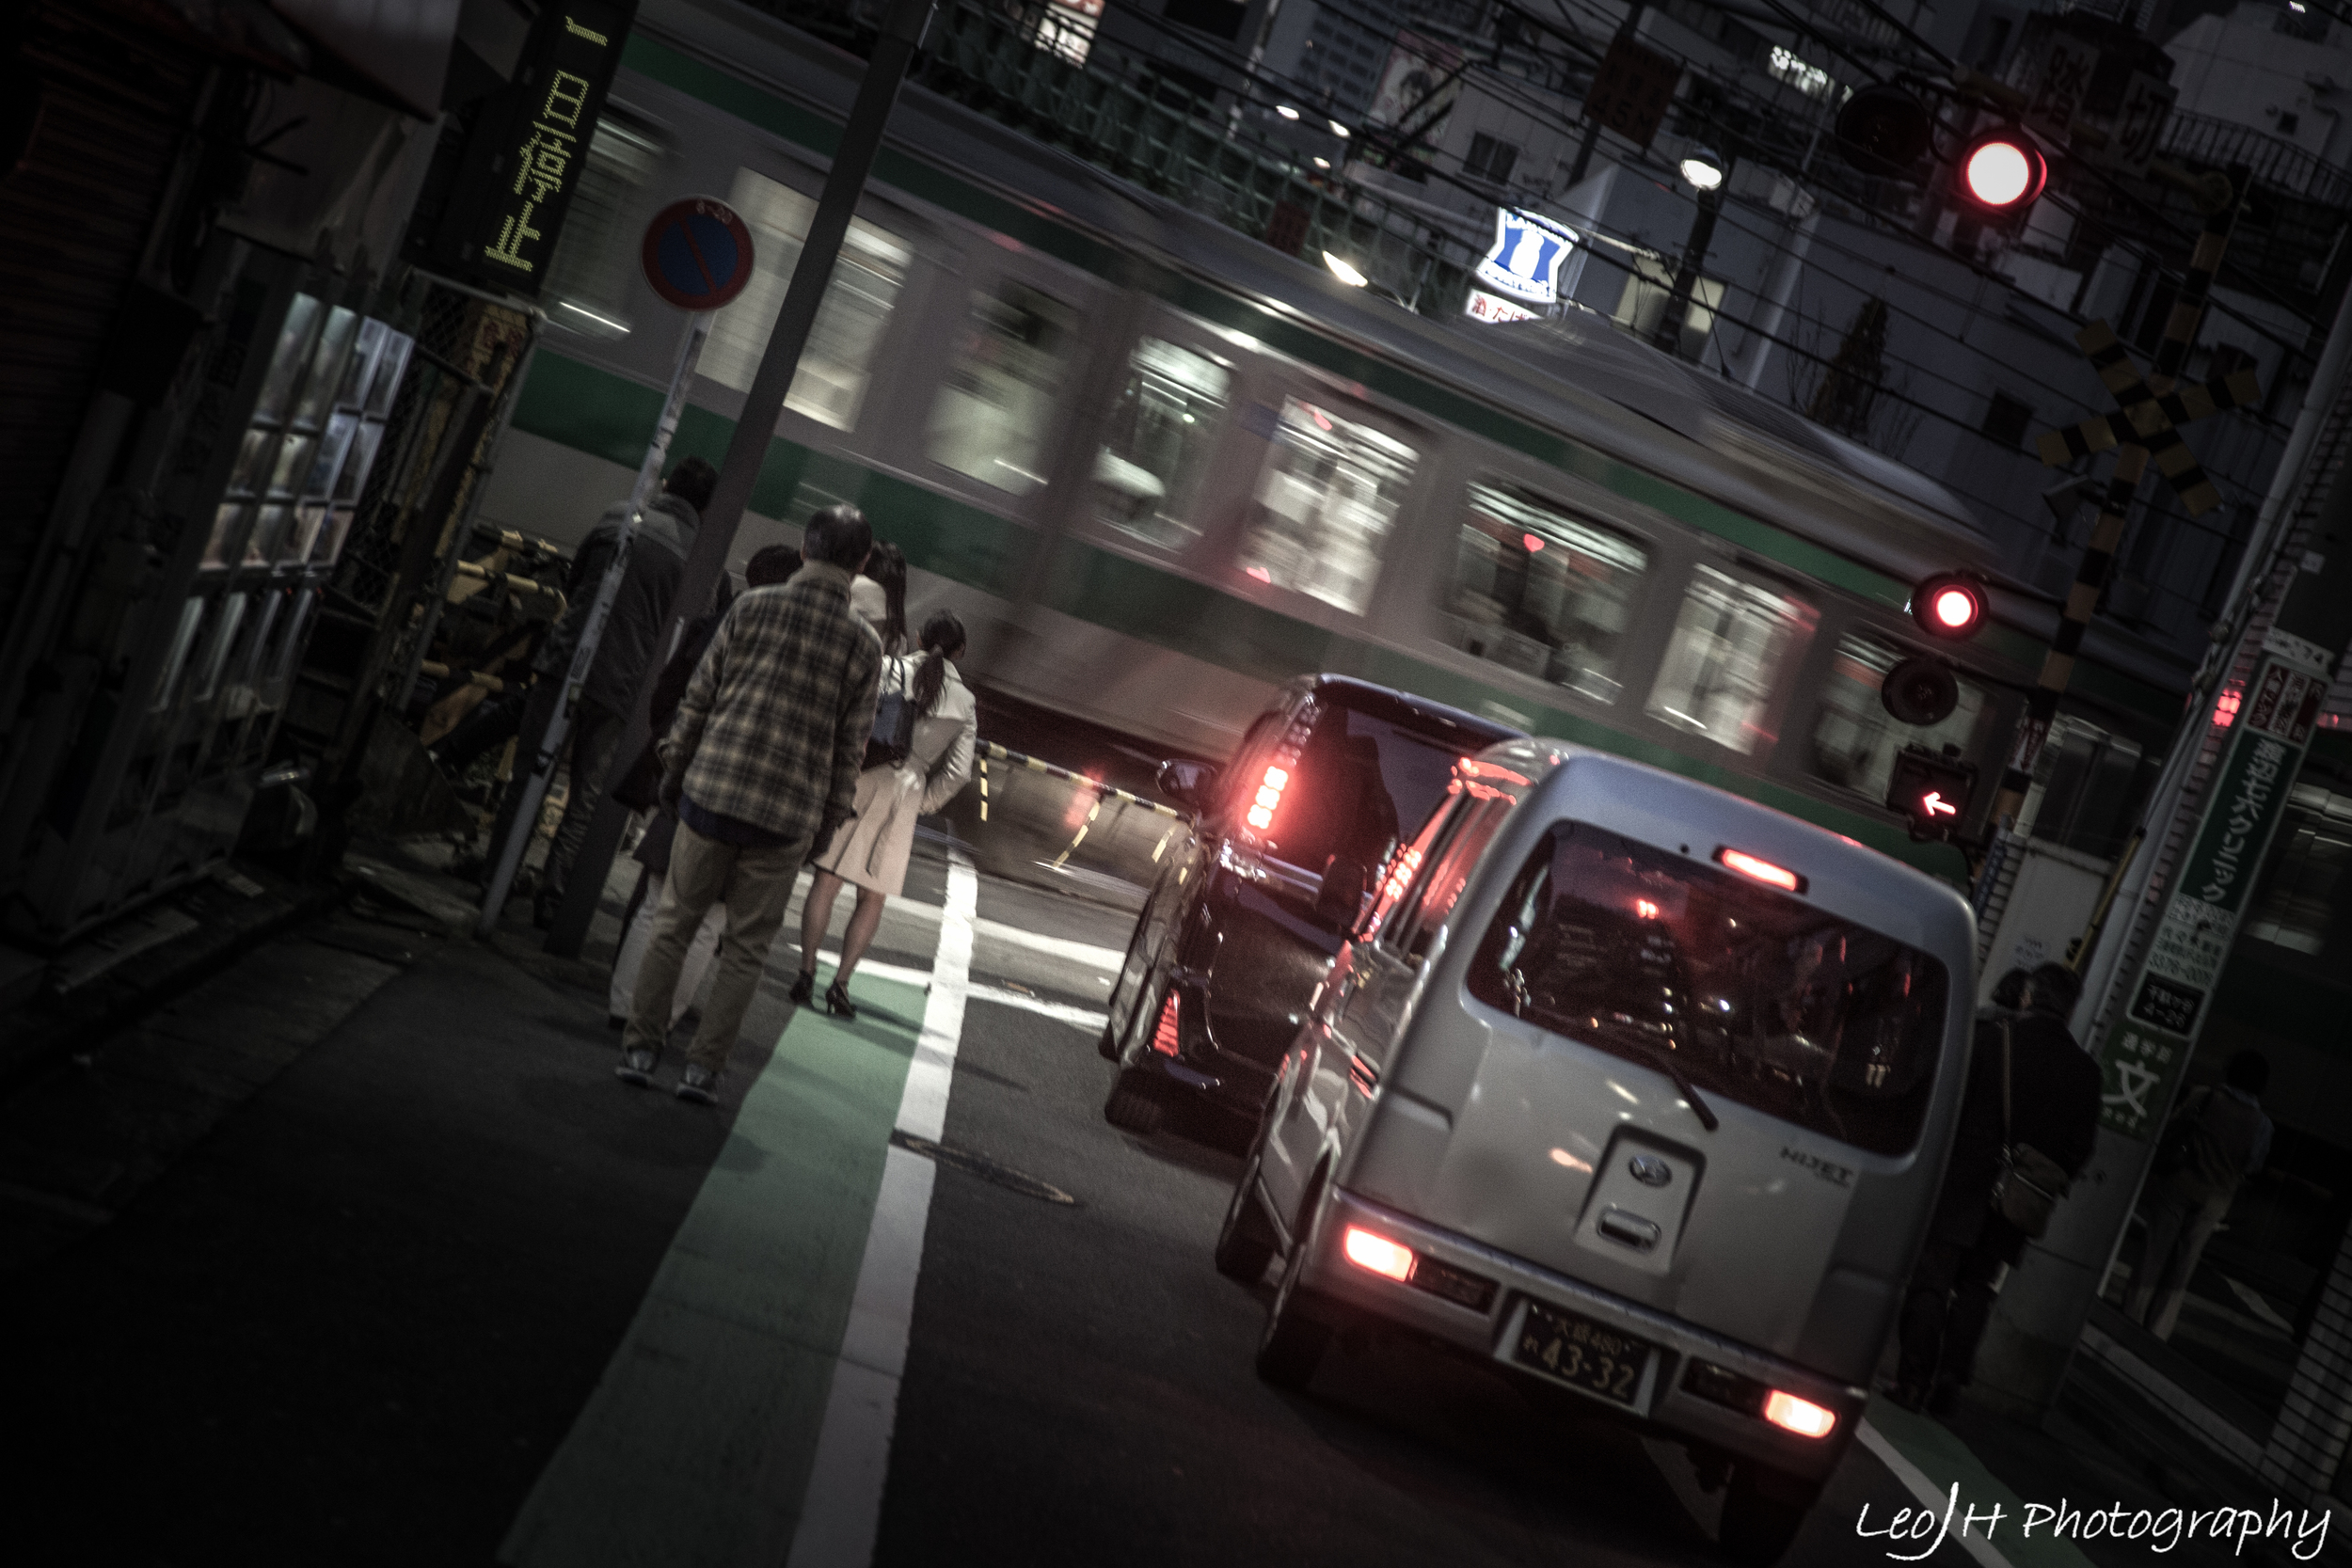 On the way from Meiji Shrine to Shinjuku